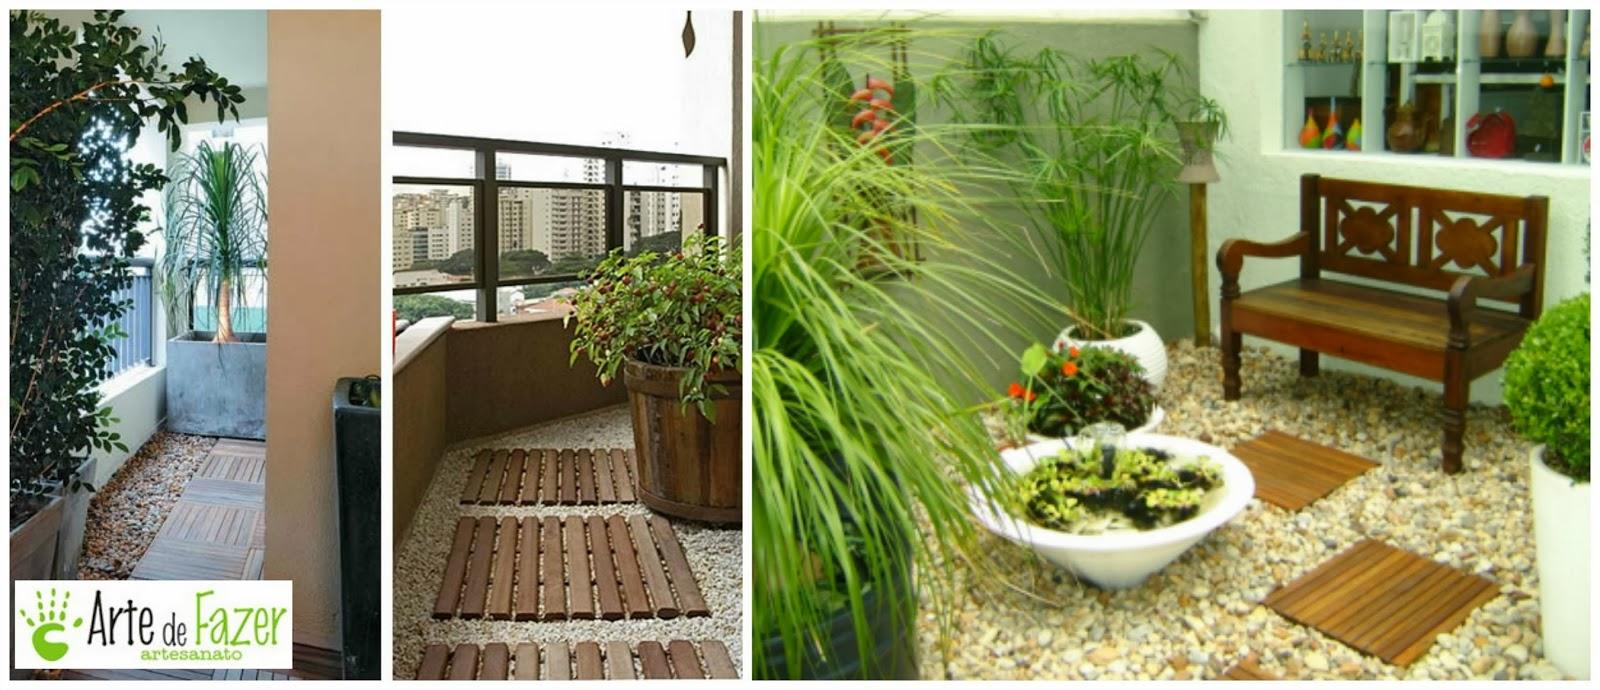 Ambiente acolhedor na varanda